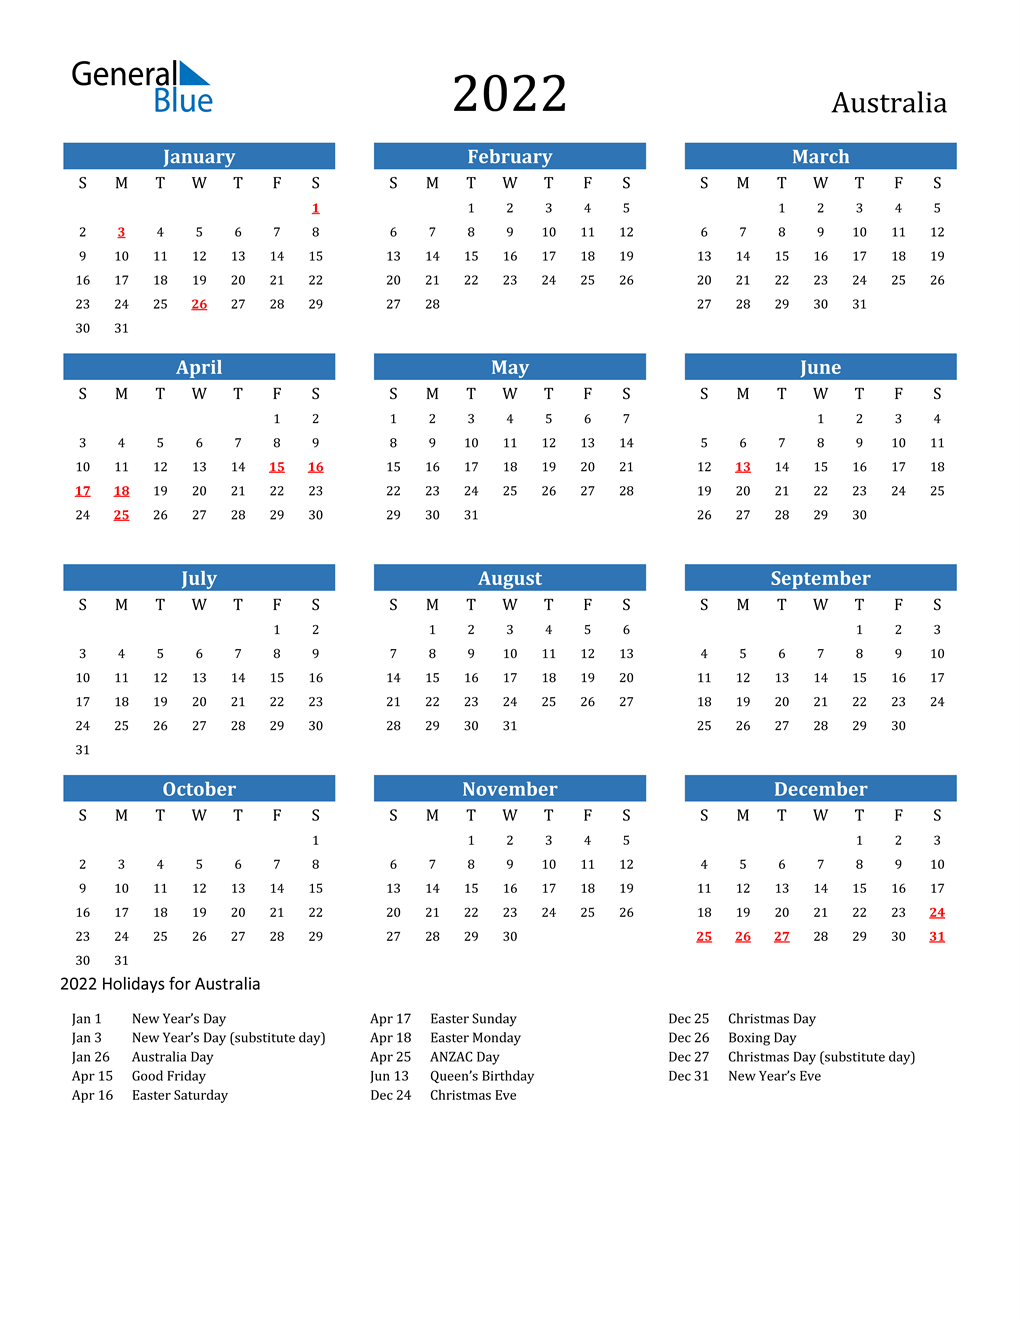 Holiday 2022 Calendar.2022 Australia Calendar With Holidays